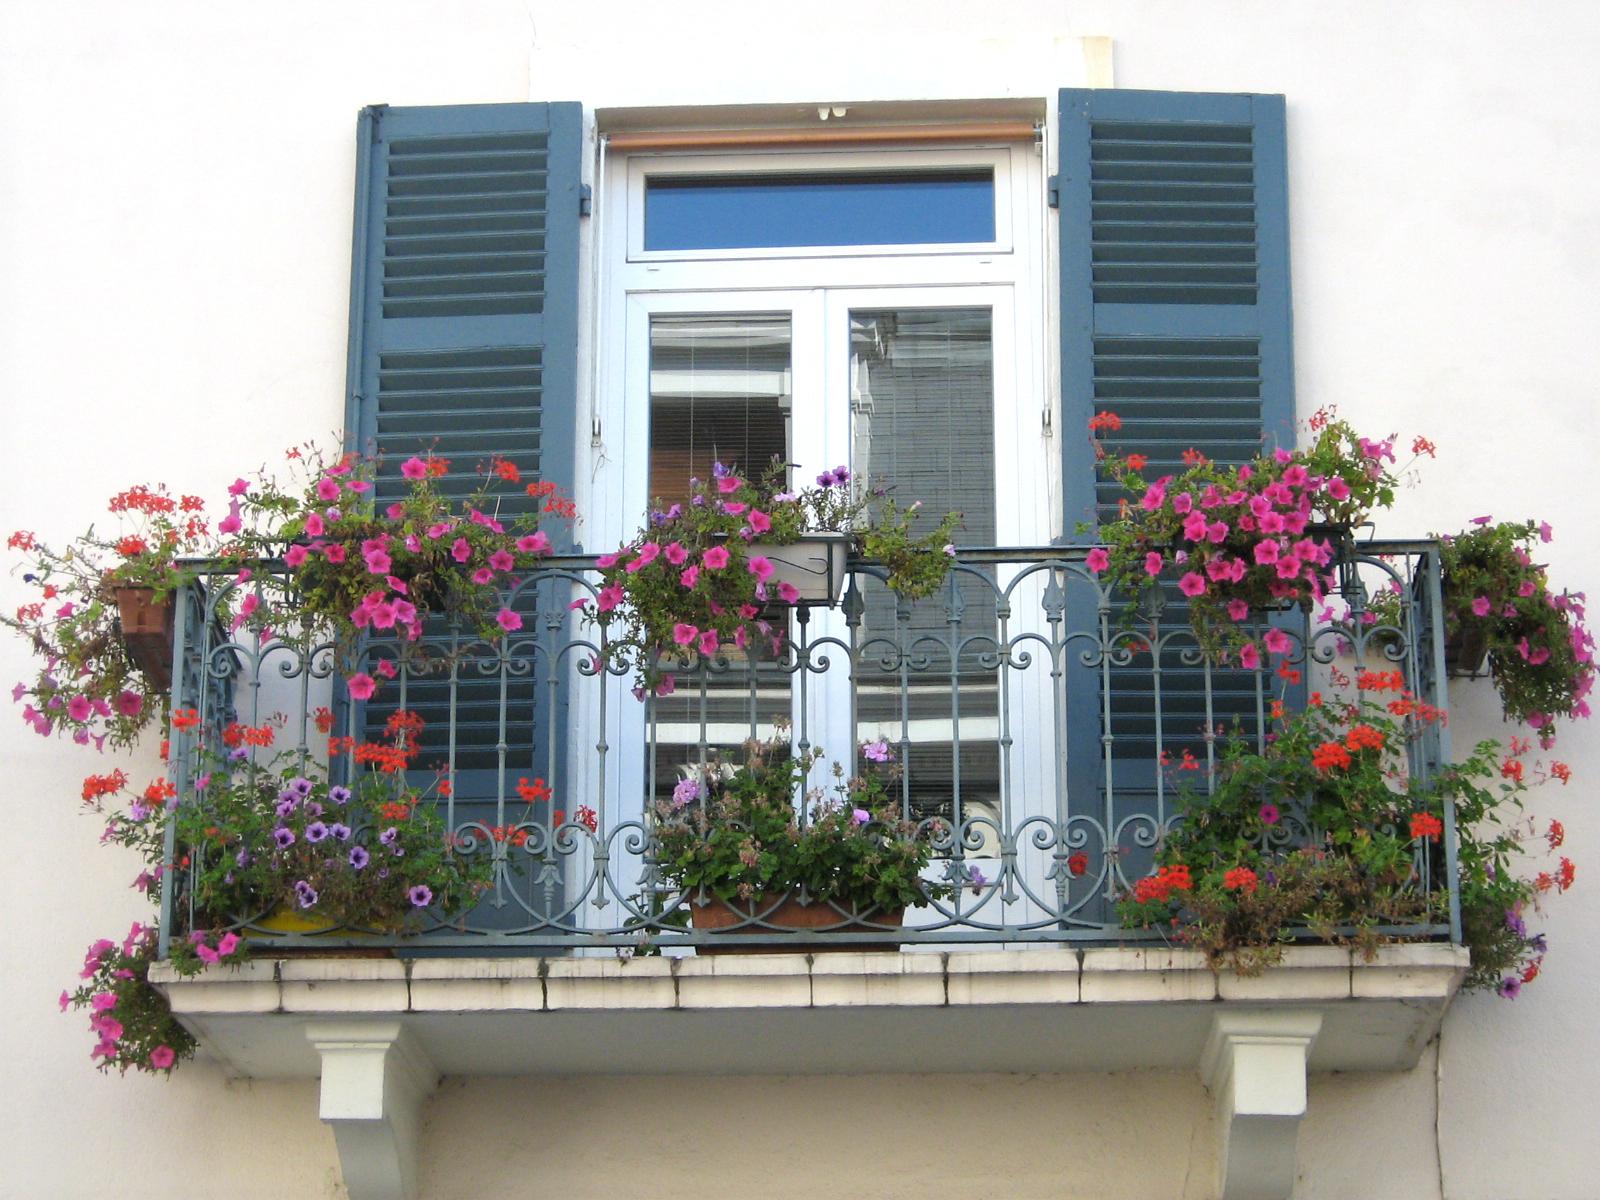 Juliet balconies: terrifying history & today's beauty (45 id.